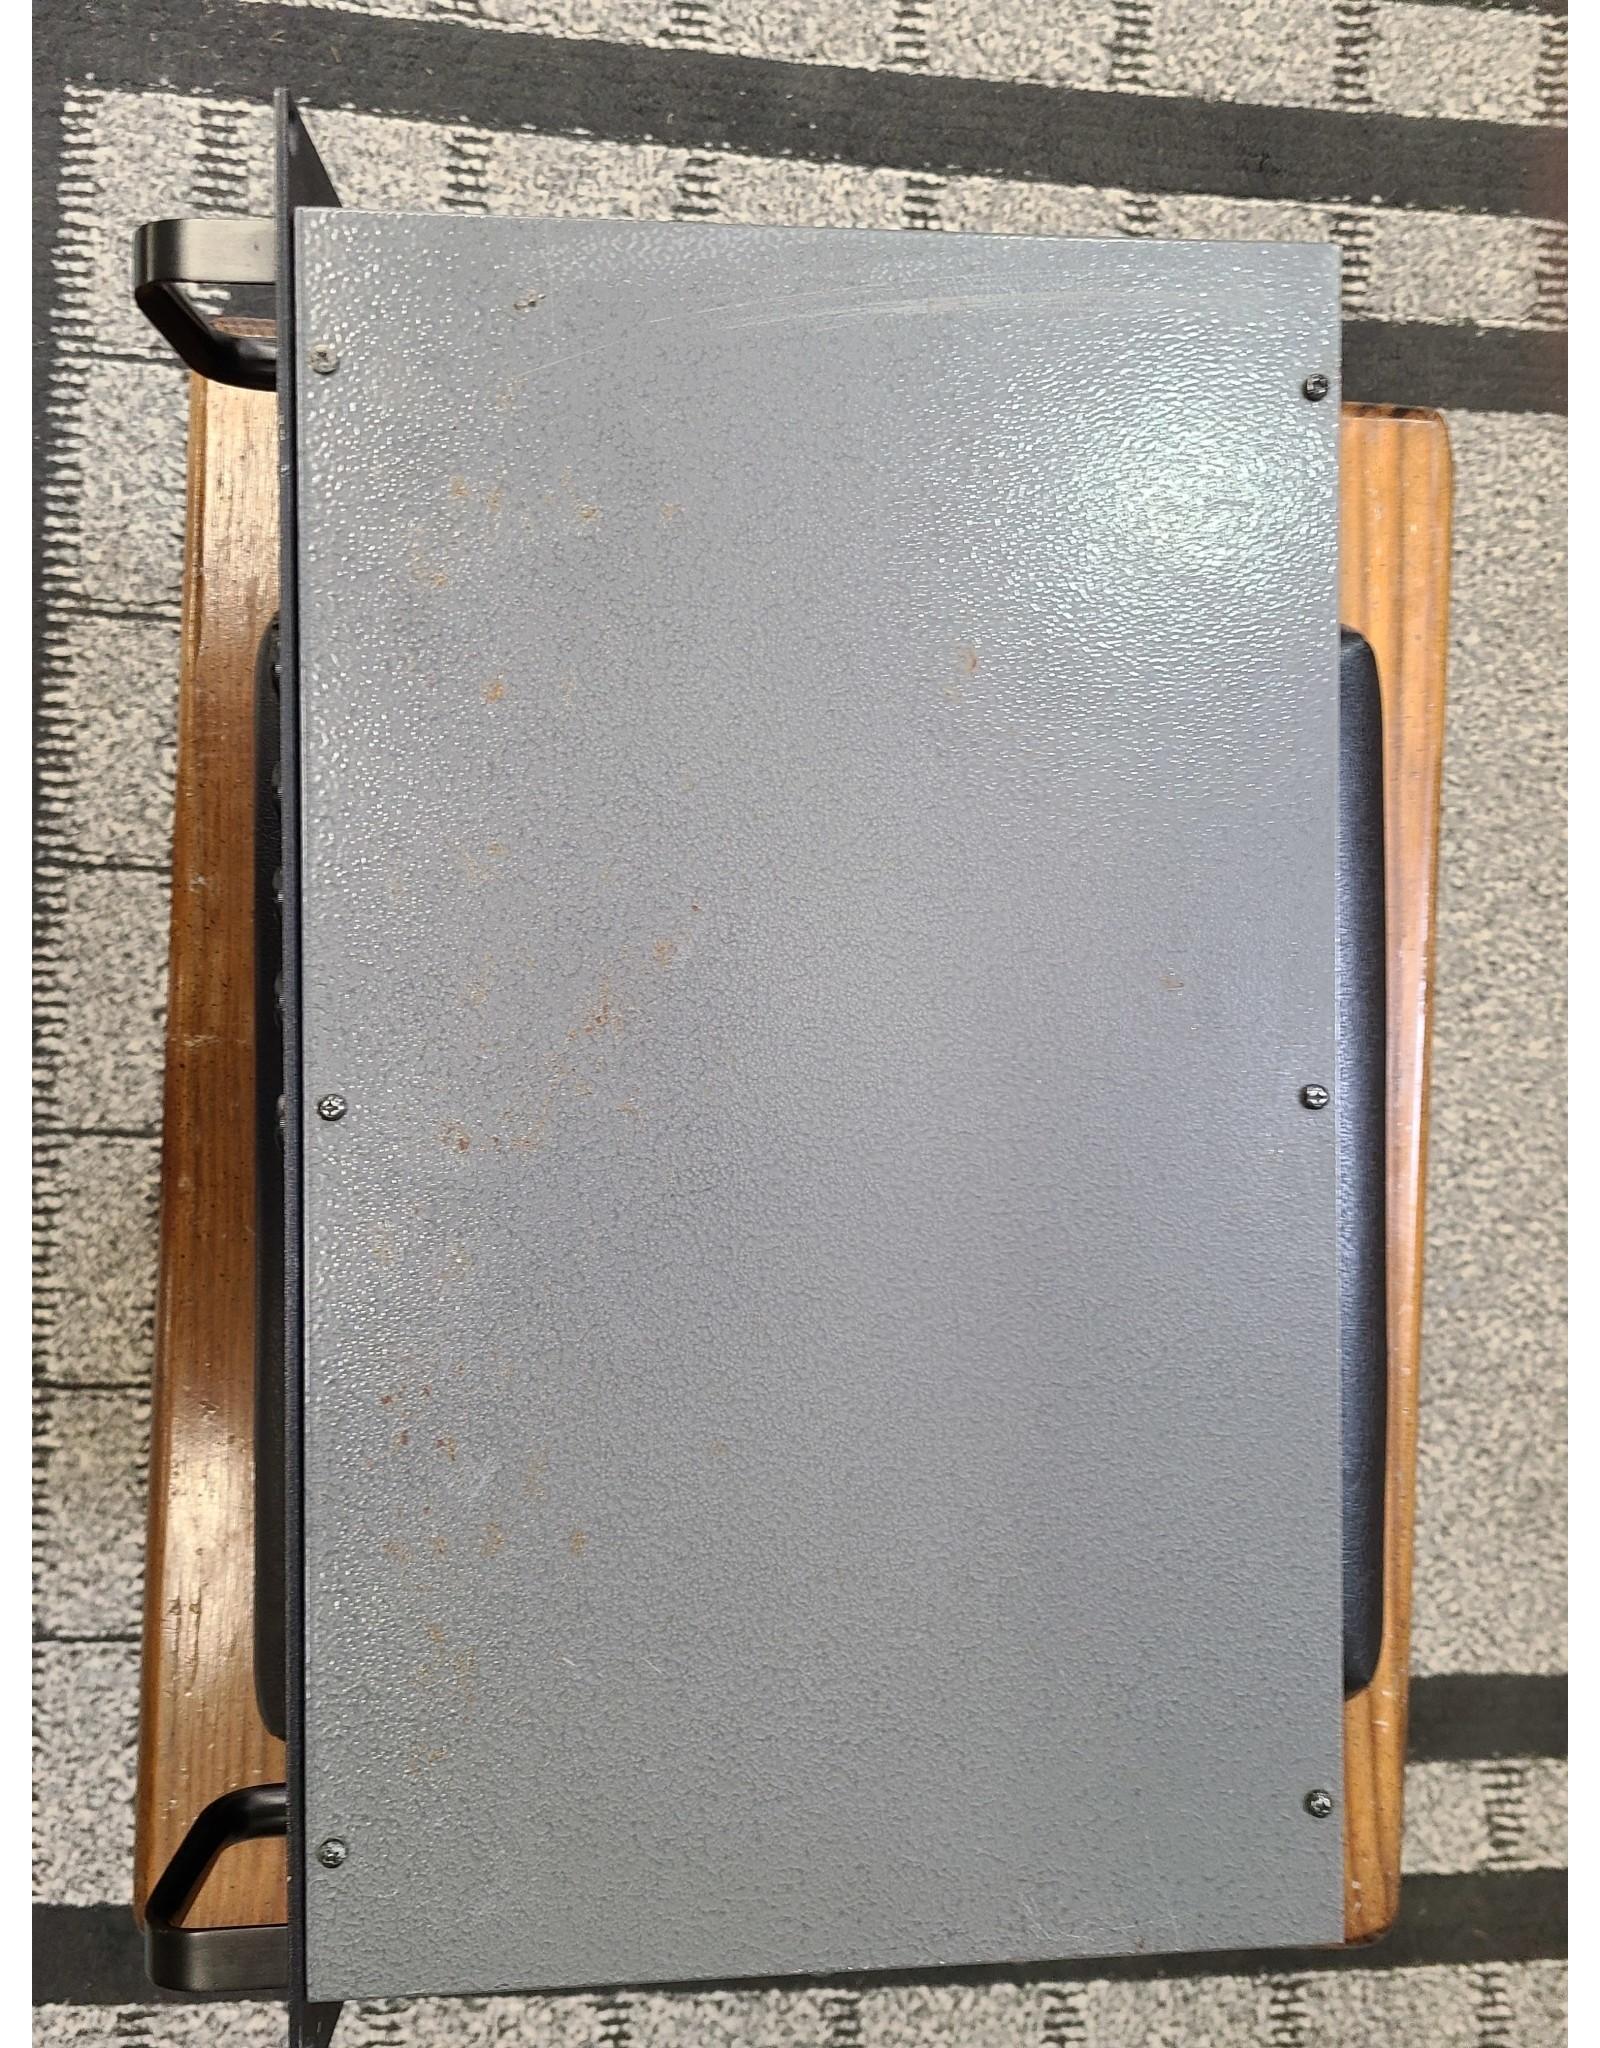 Ampeg Ampeg B1-RE 300-Watt Bass Amp Head (used)